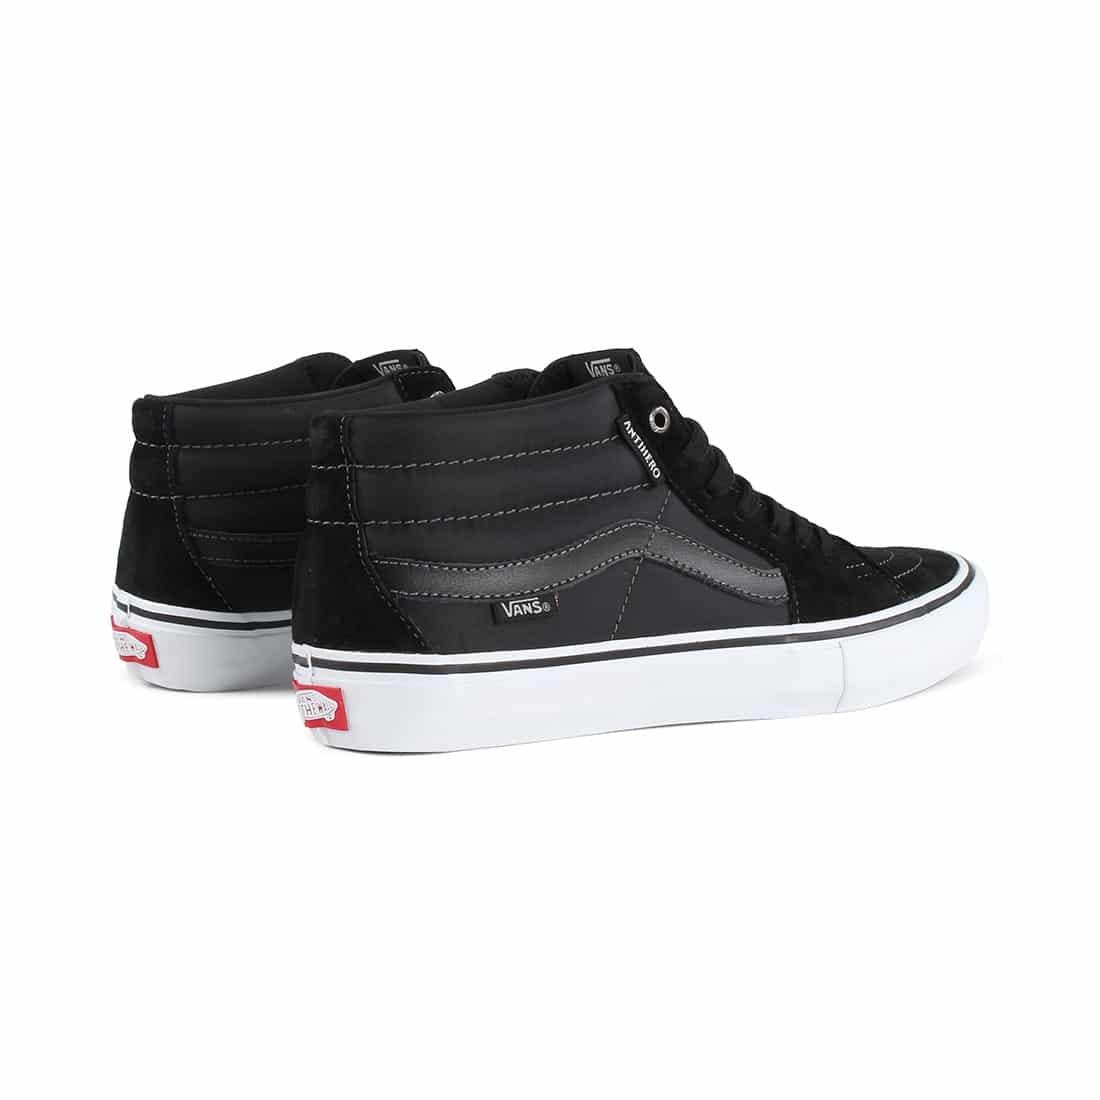 c7444c1a1a Vans x Anti Hero Sk8-Mid Pro Skate Shoes - Grosso   Black